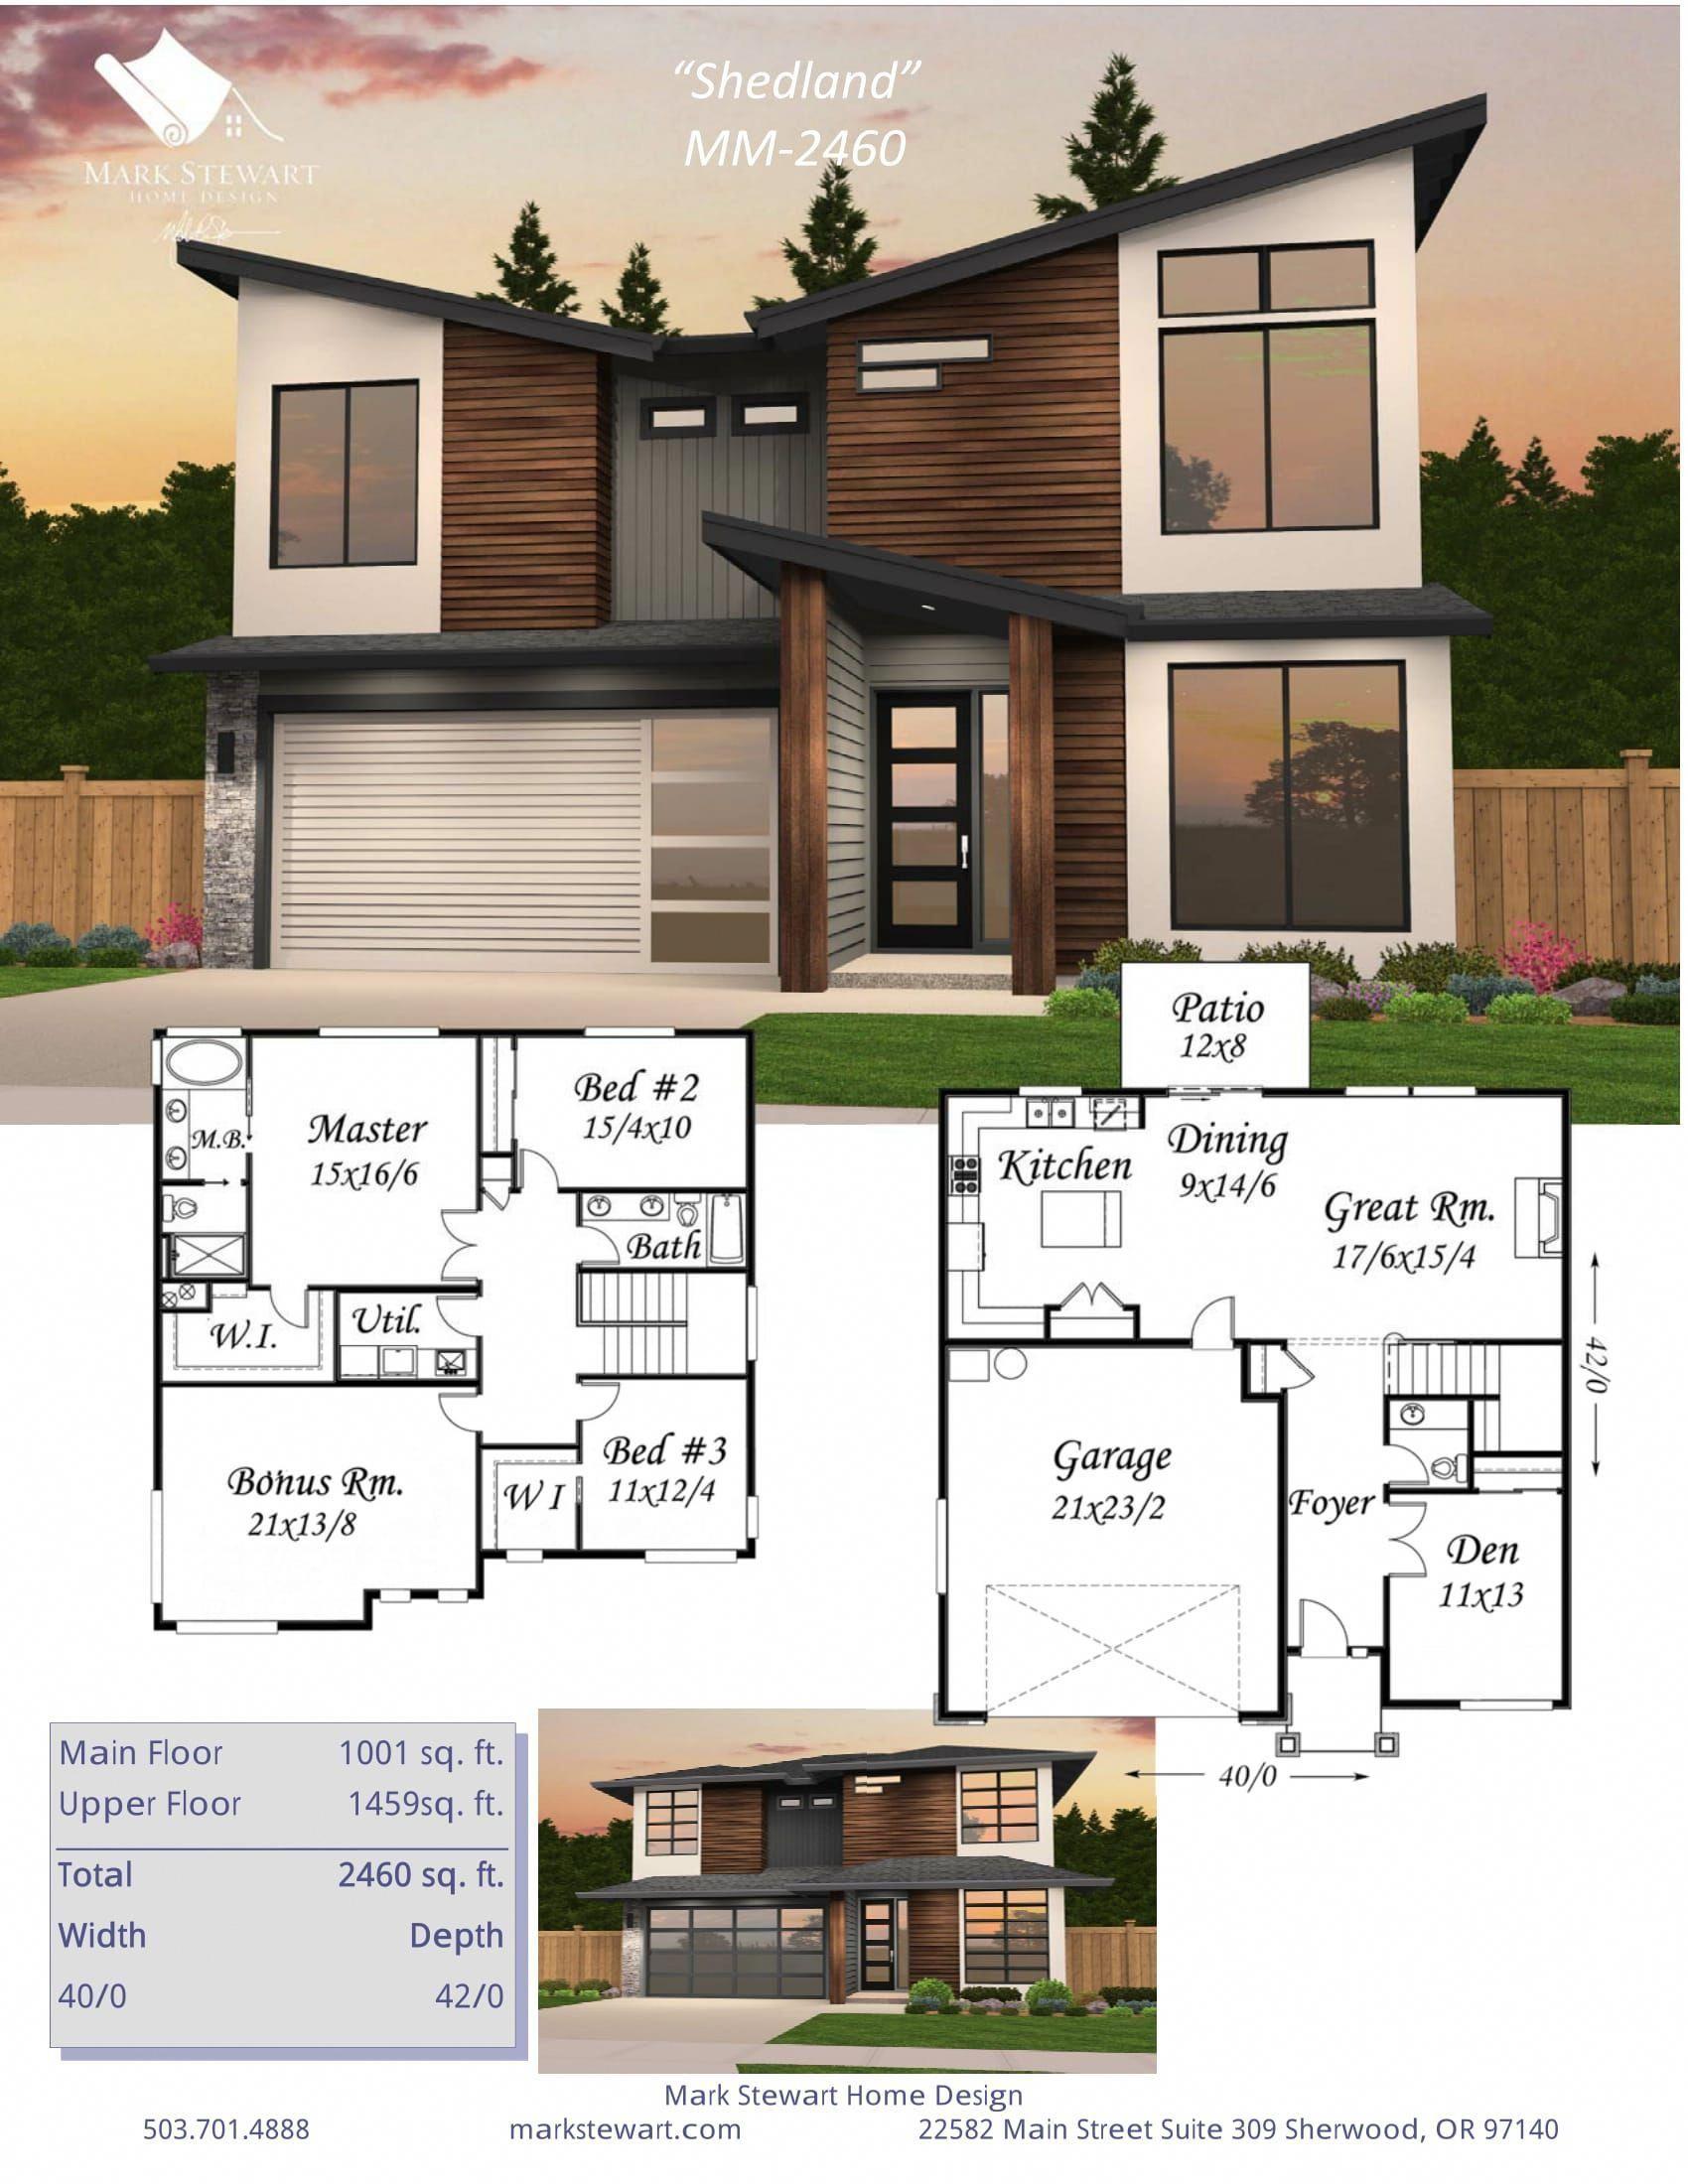 Modern Home Design Blueprints Modernhomedesign Affordable House Plans Sims House Plans Modern House Design